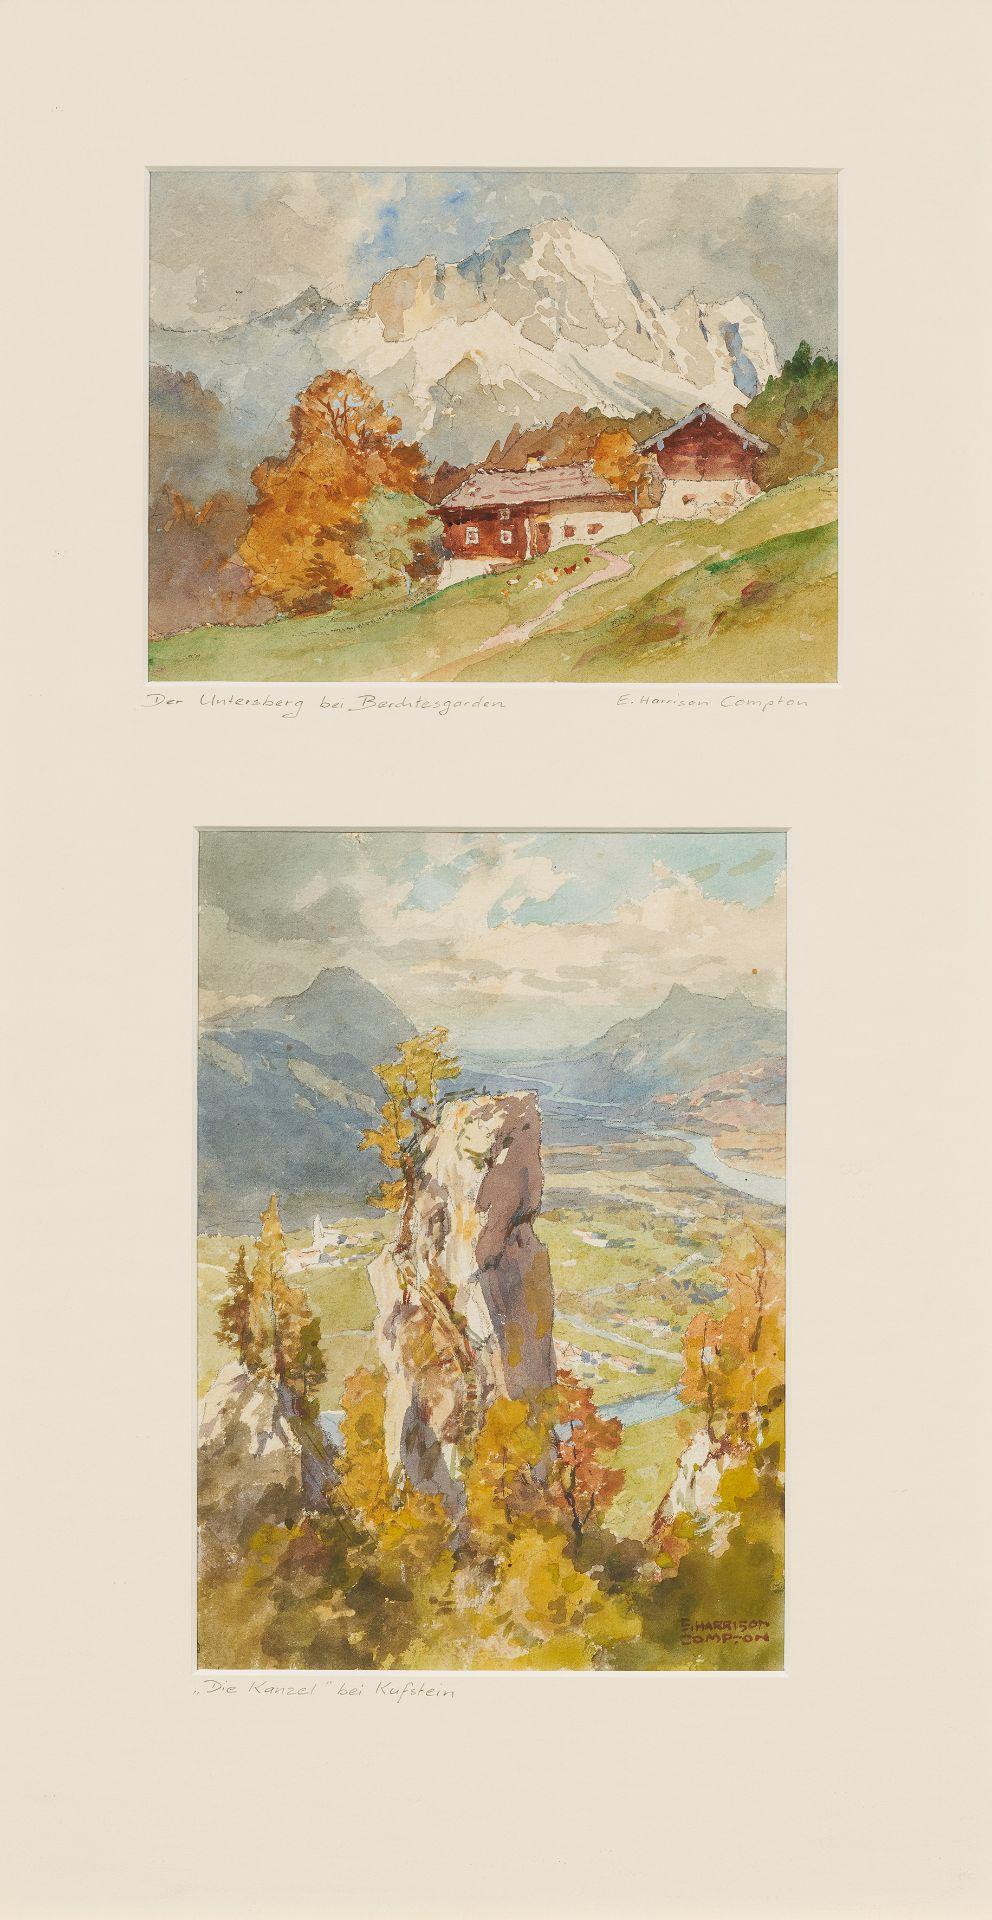 Compton, Edward Harrison. Feldafing 1881 - 1960. Zwei Aquarelle: Der Untersberg bei